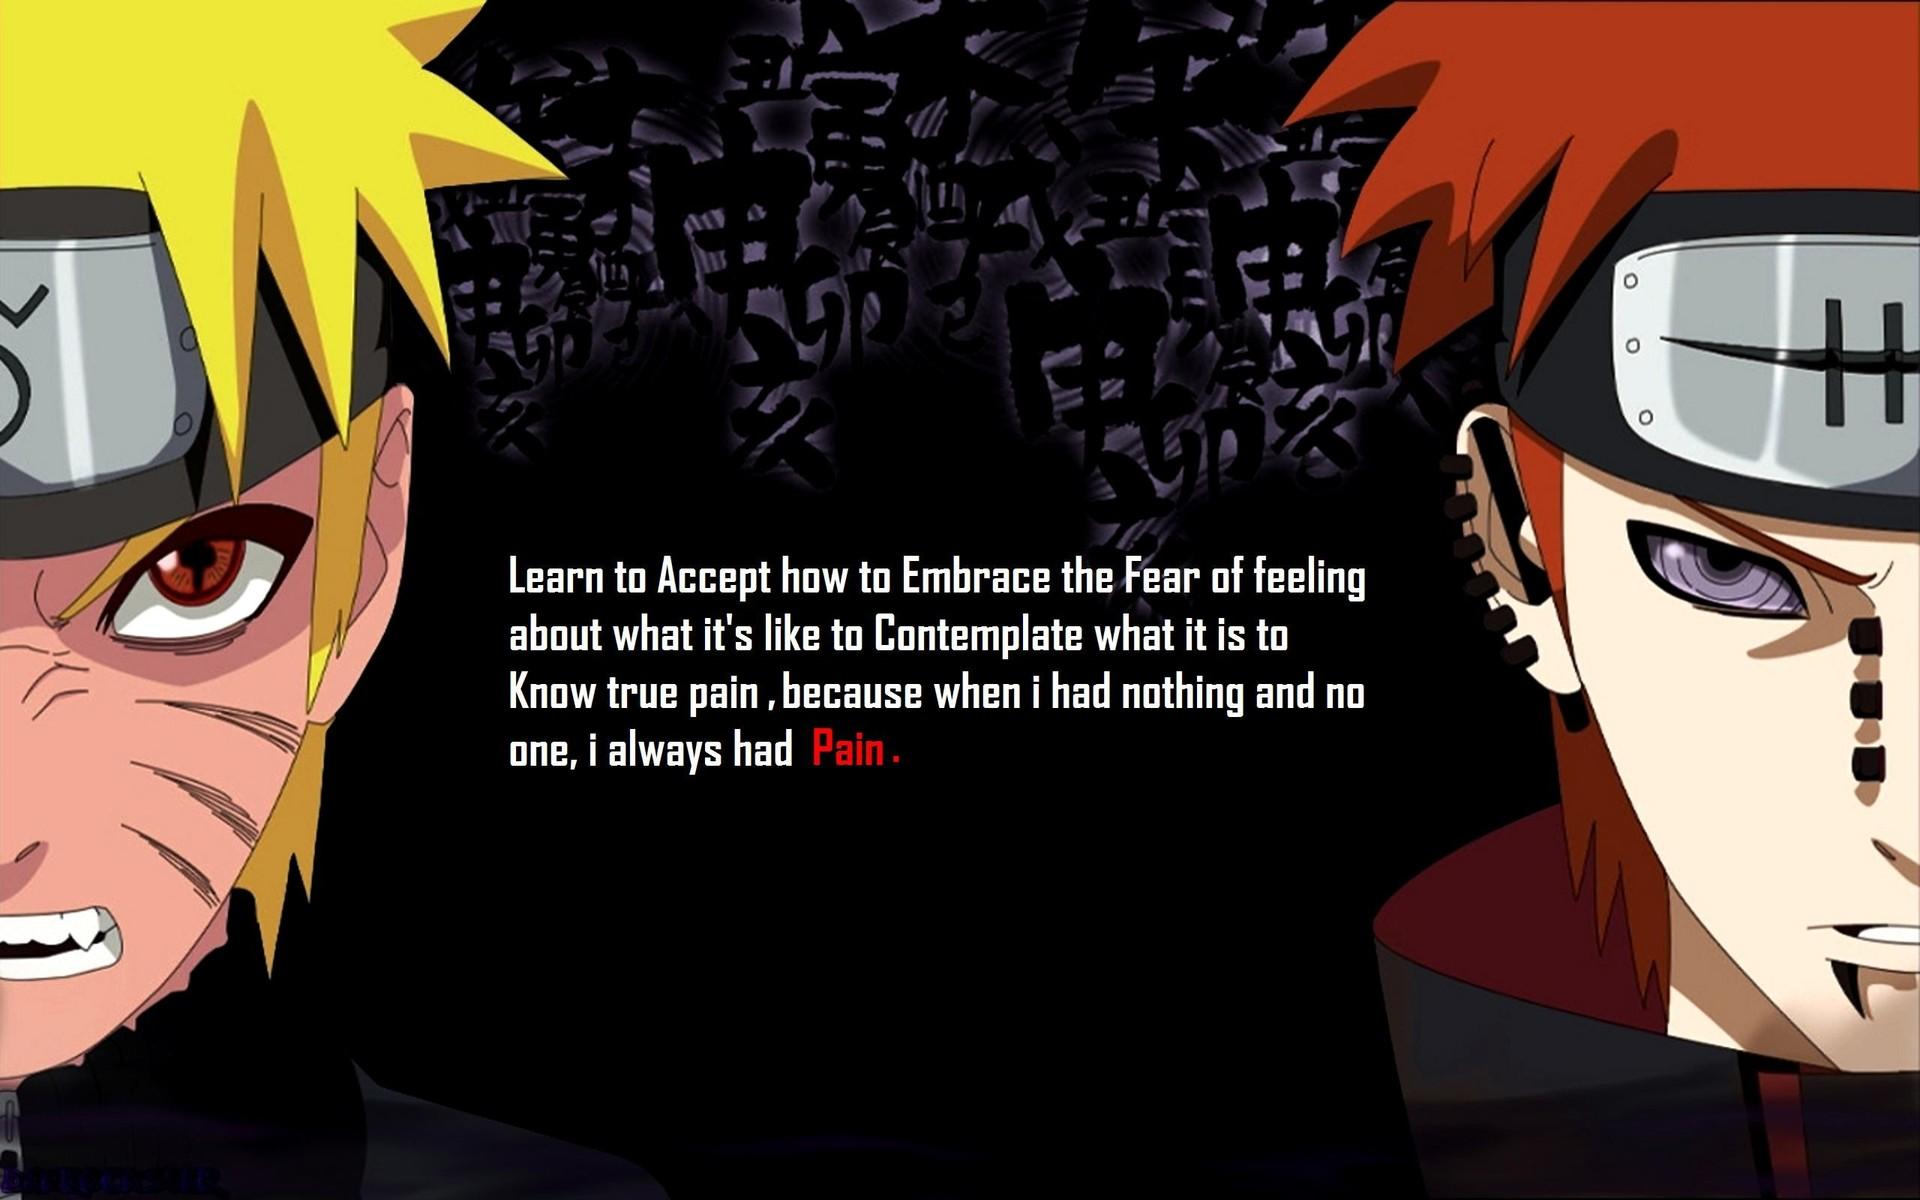 1080+ Gambar Kata Bijak Naruto Gratis Terbaru